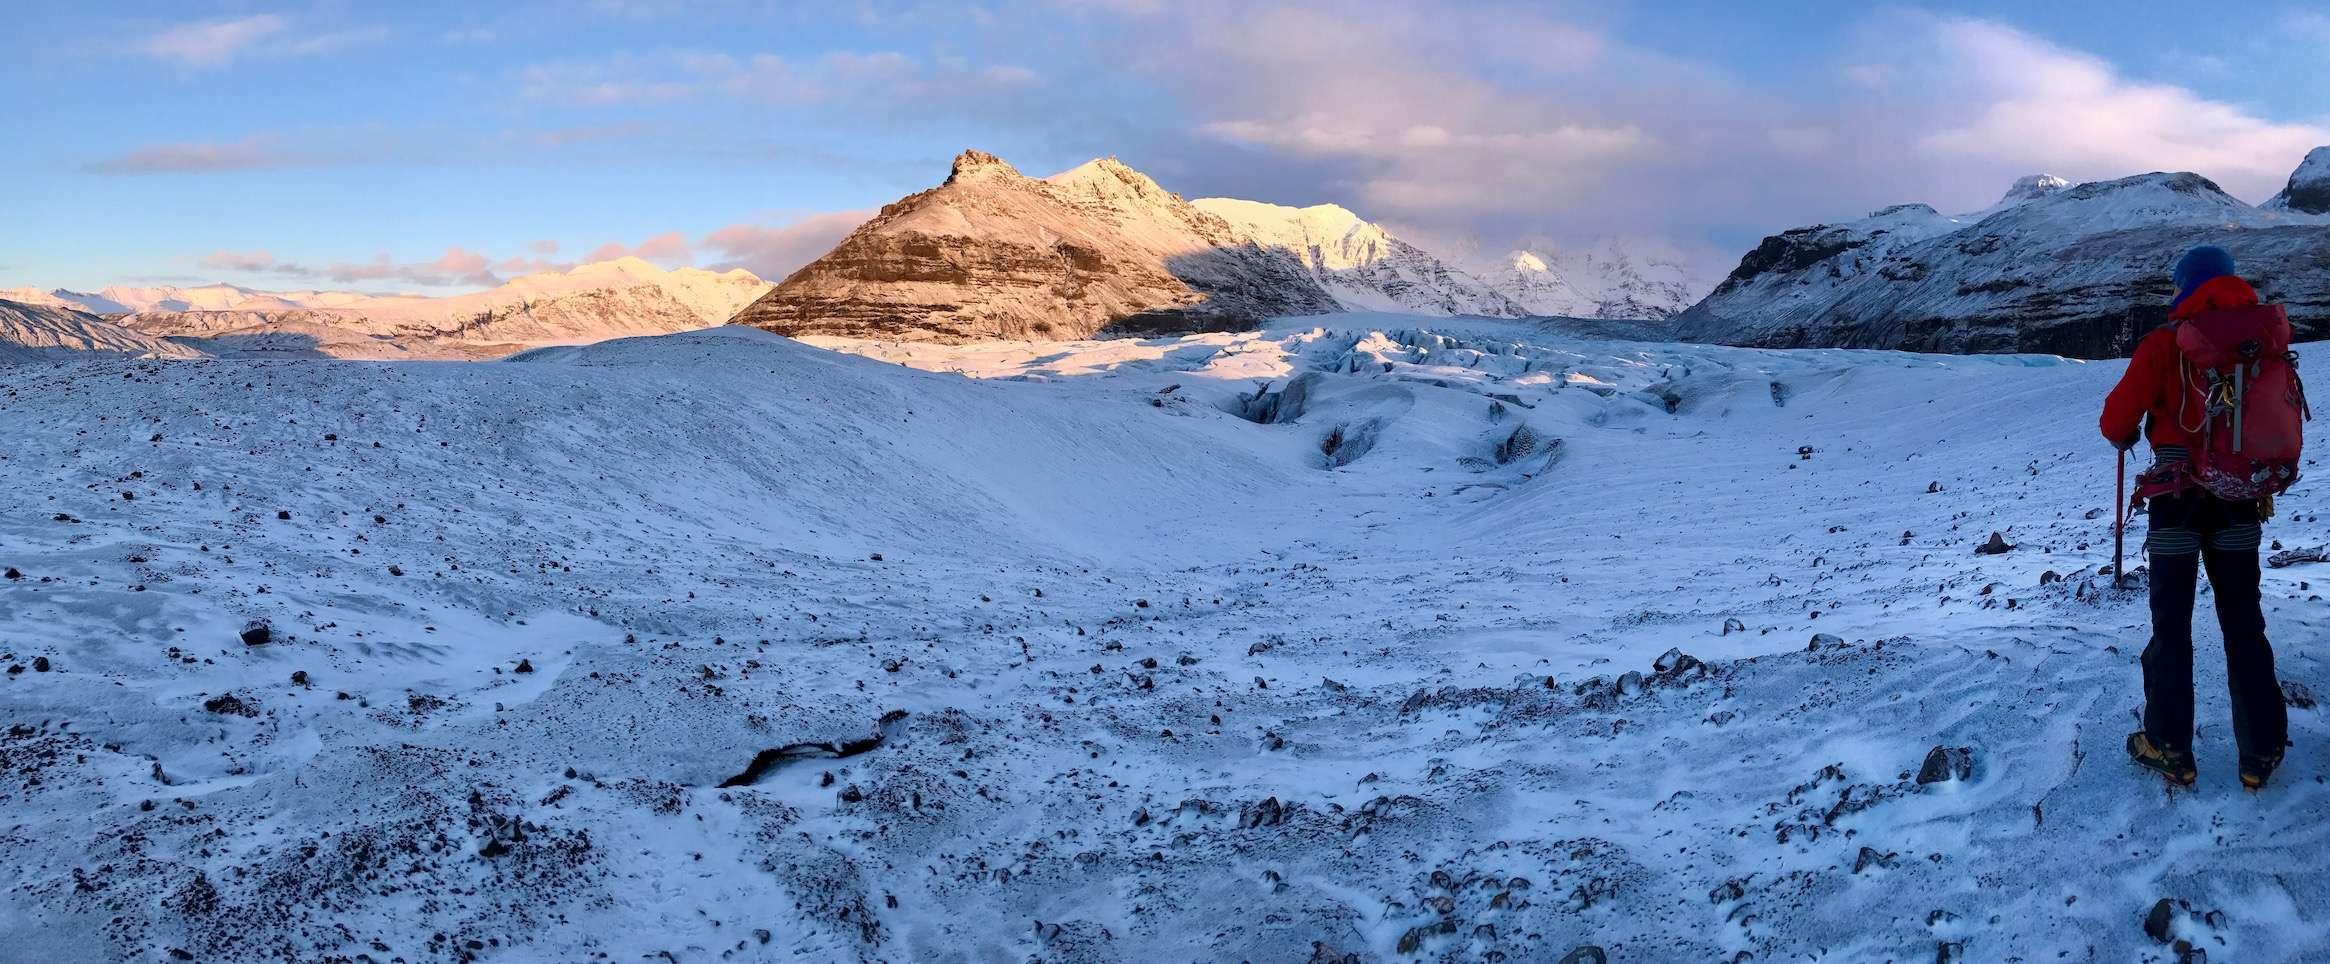 iceland glacier hike ready